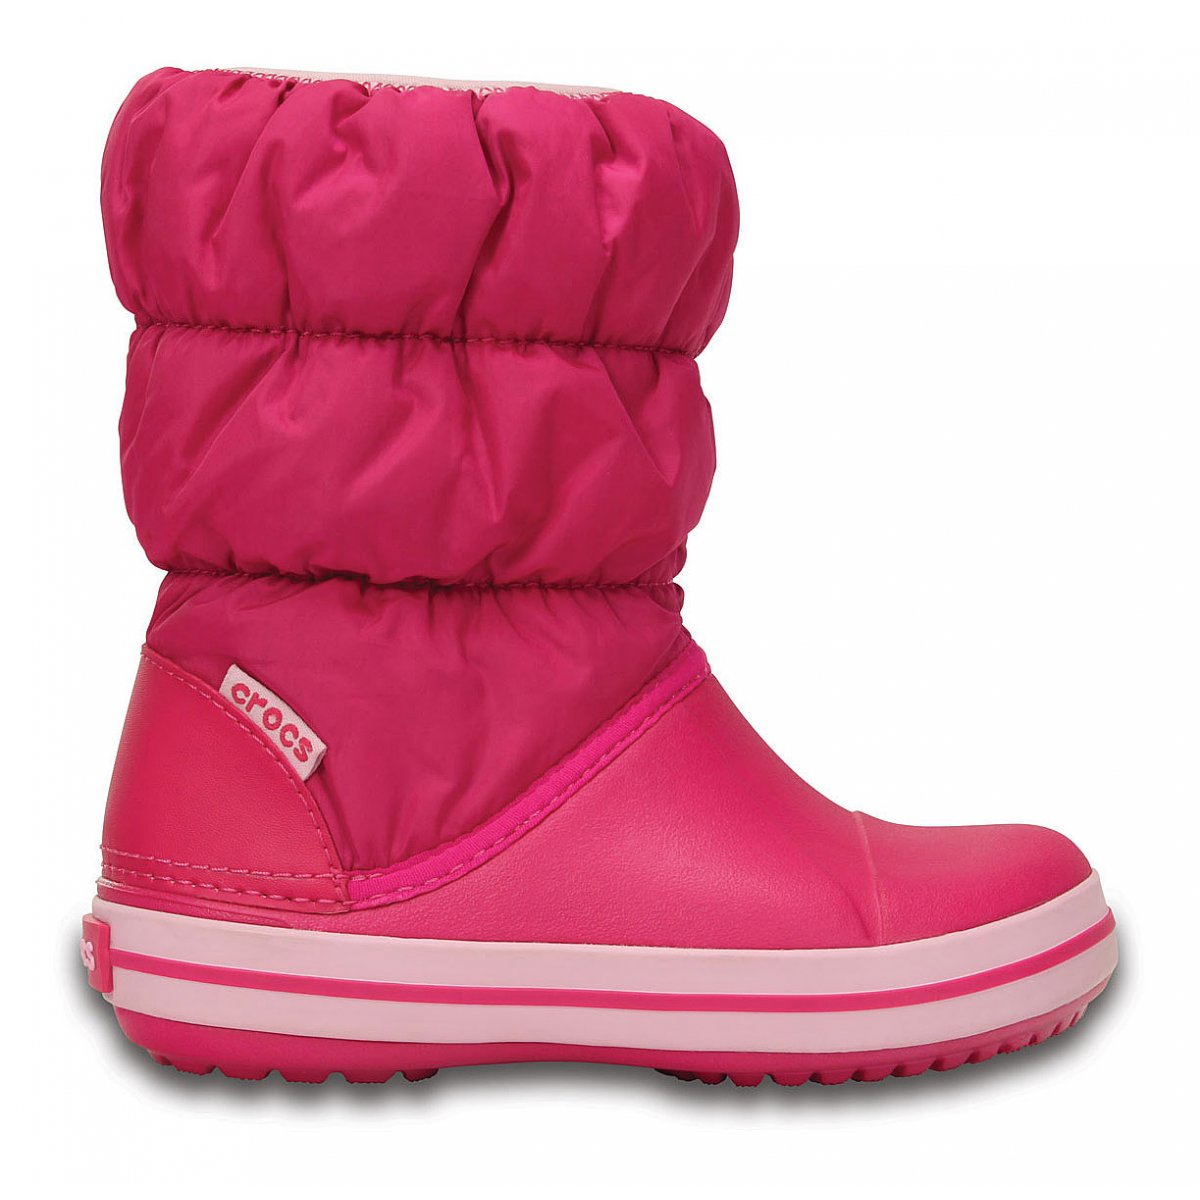 quality design 5efc4 6487c Winter Puff Boot K - Stivali Footwear Bambina | Crocs Italia